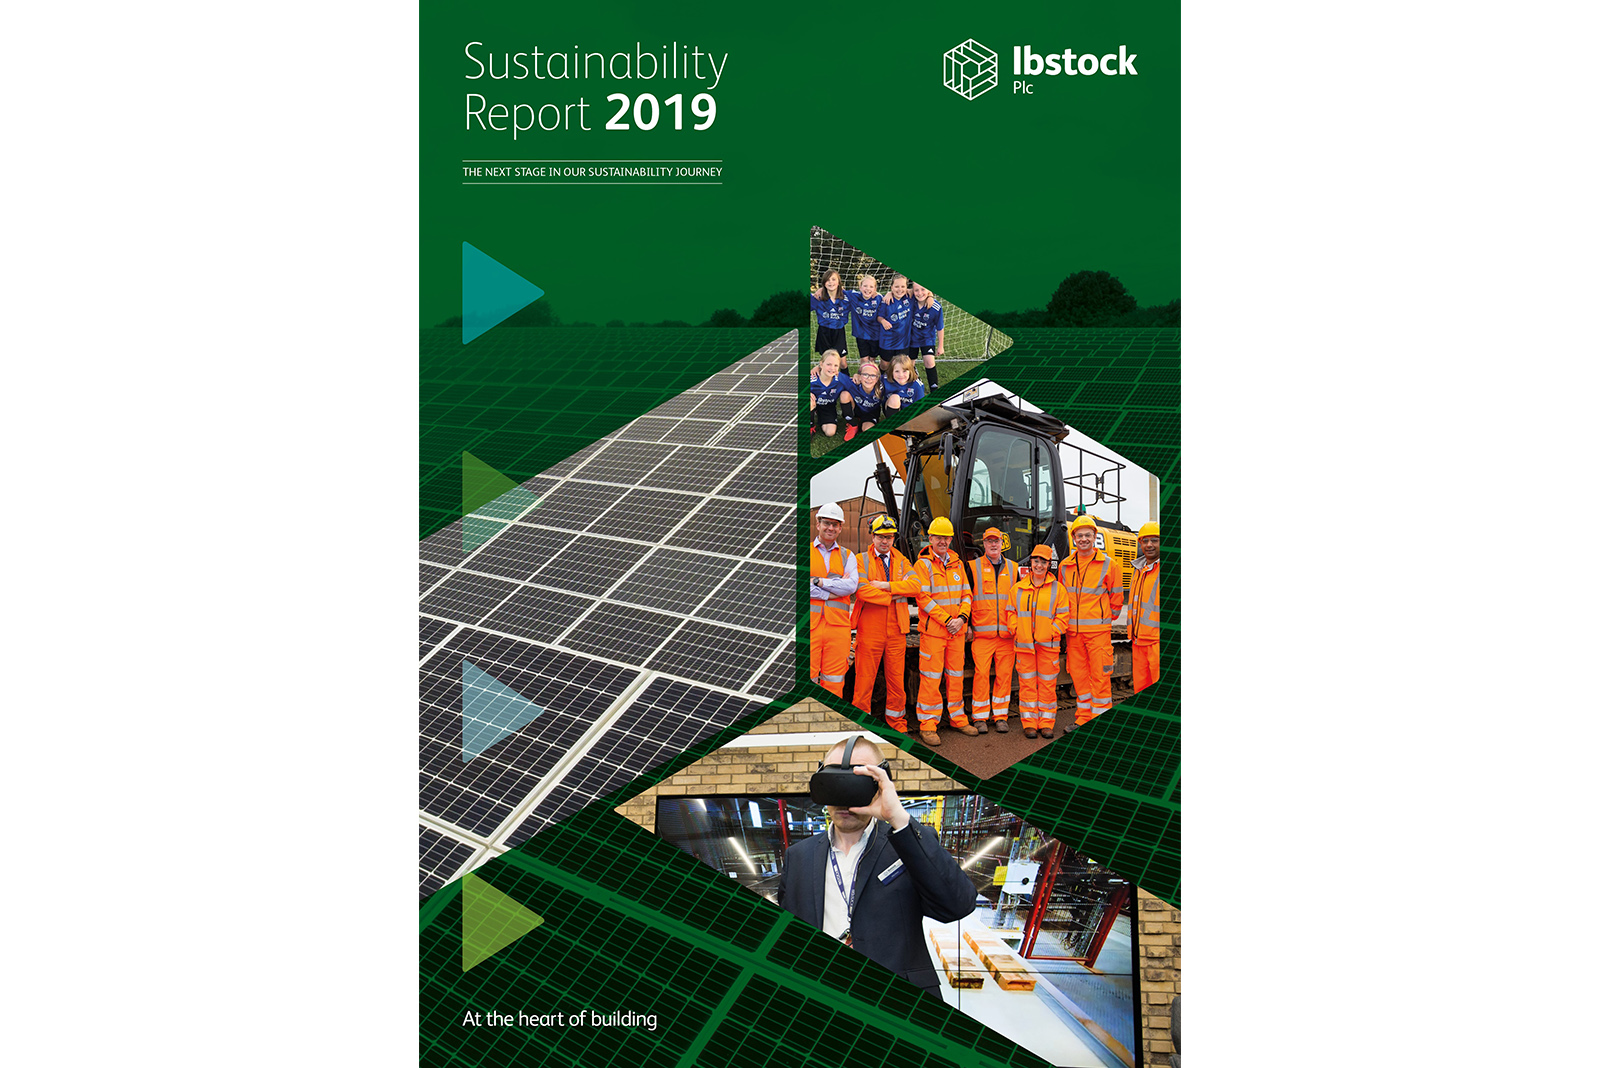 Ibstock plc's 2019 Sustainability Report